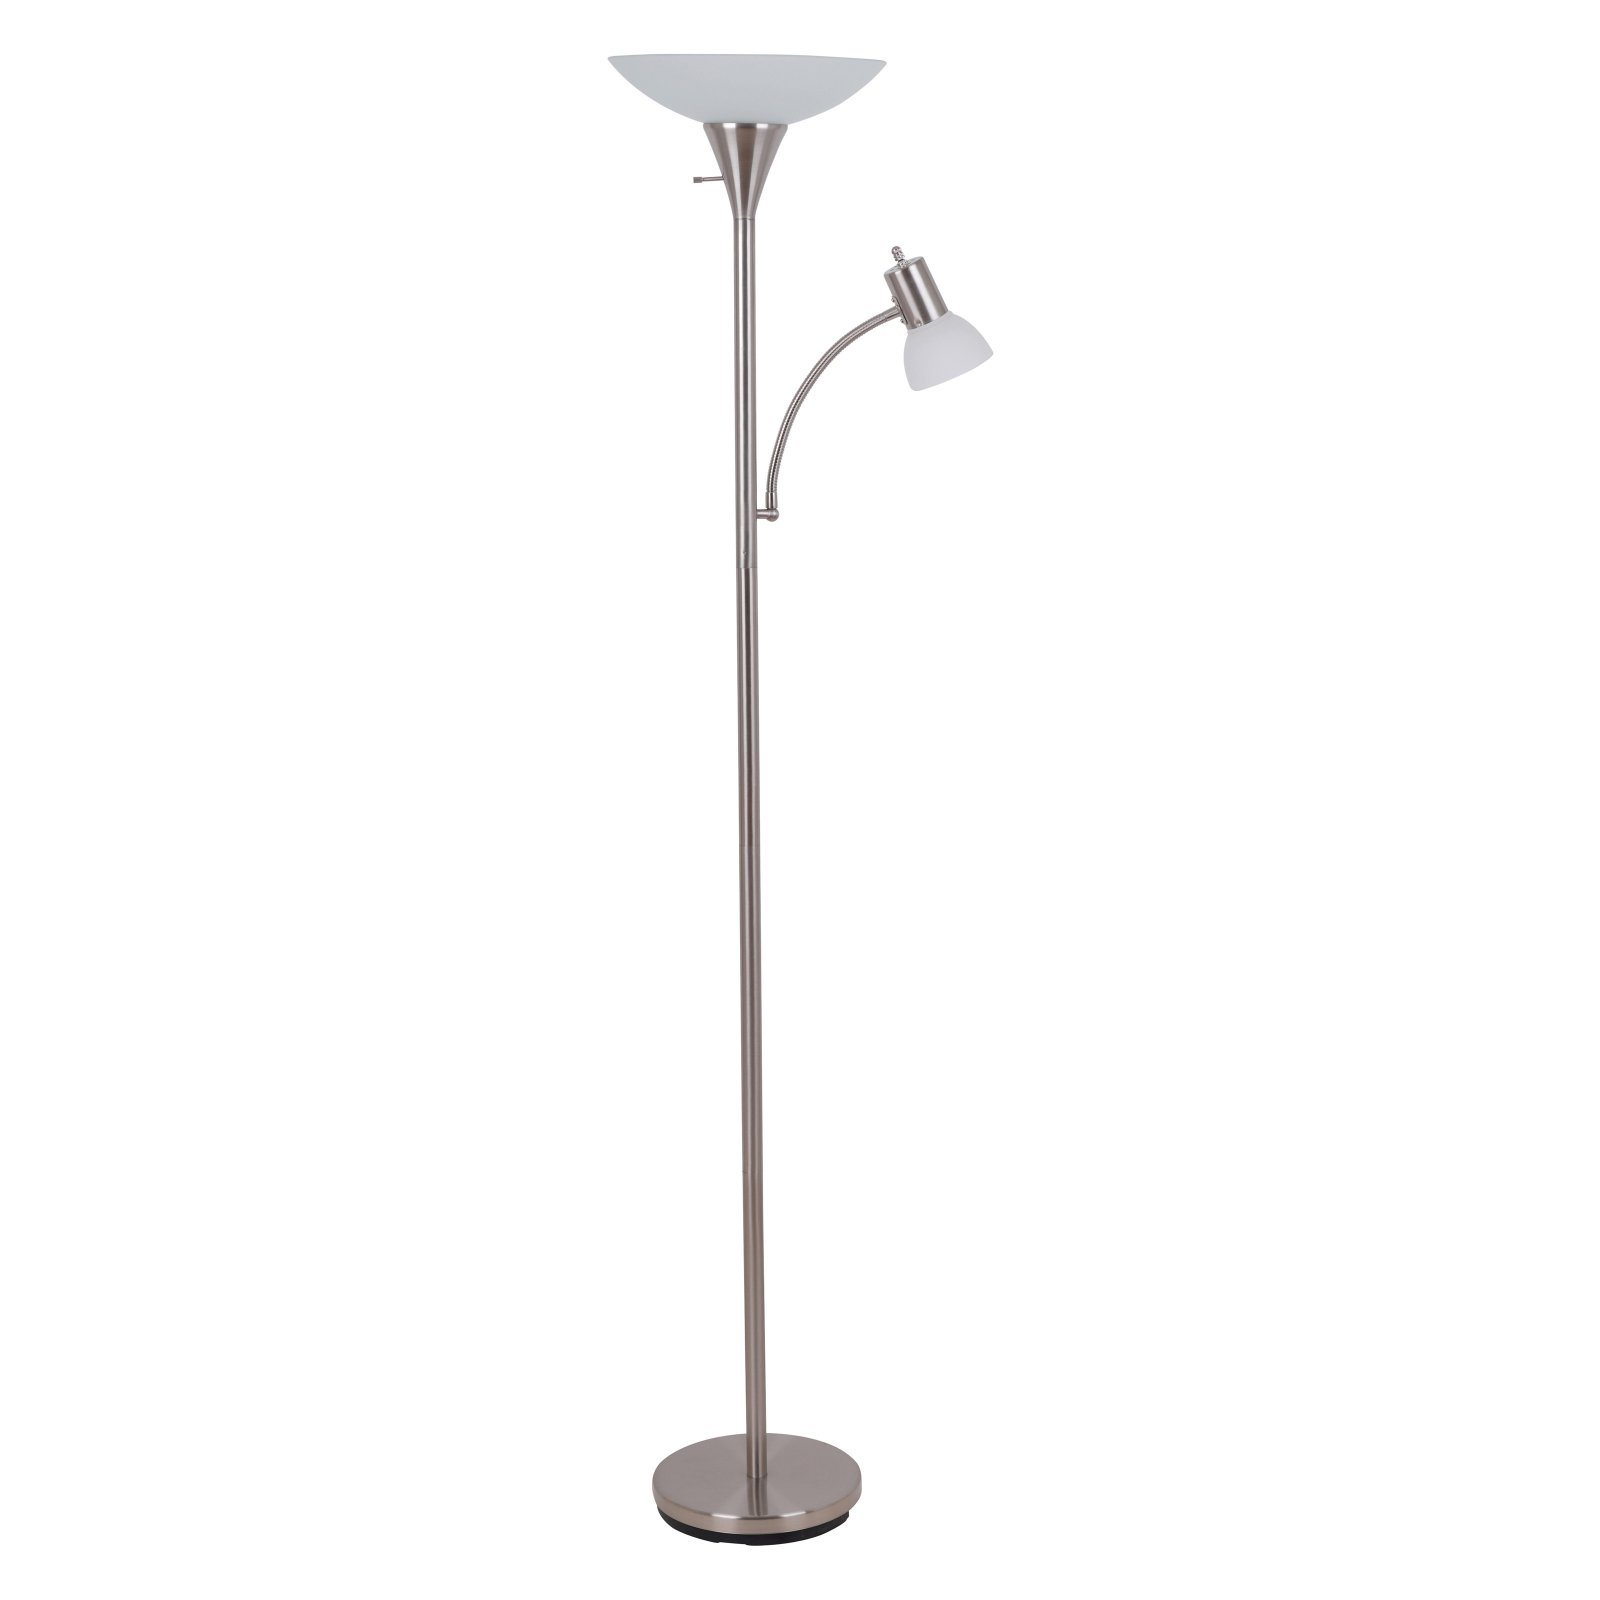 "Catalina 71"" Combo Floor Lamp, Brushed Nickel Finish by Evolution Lighting, LLC"